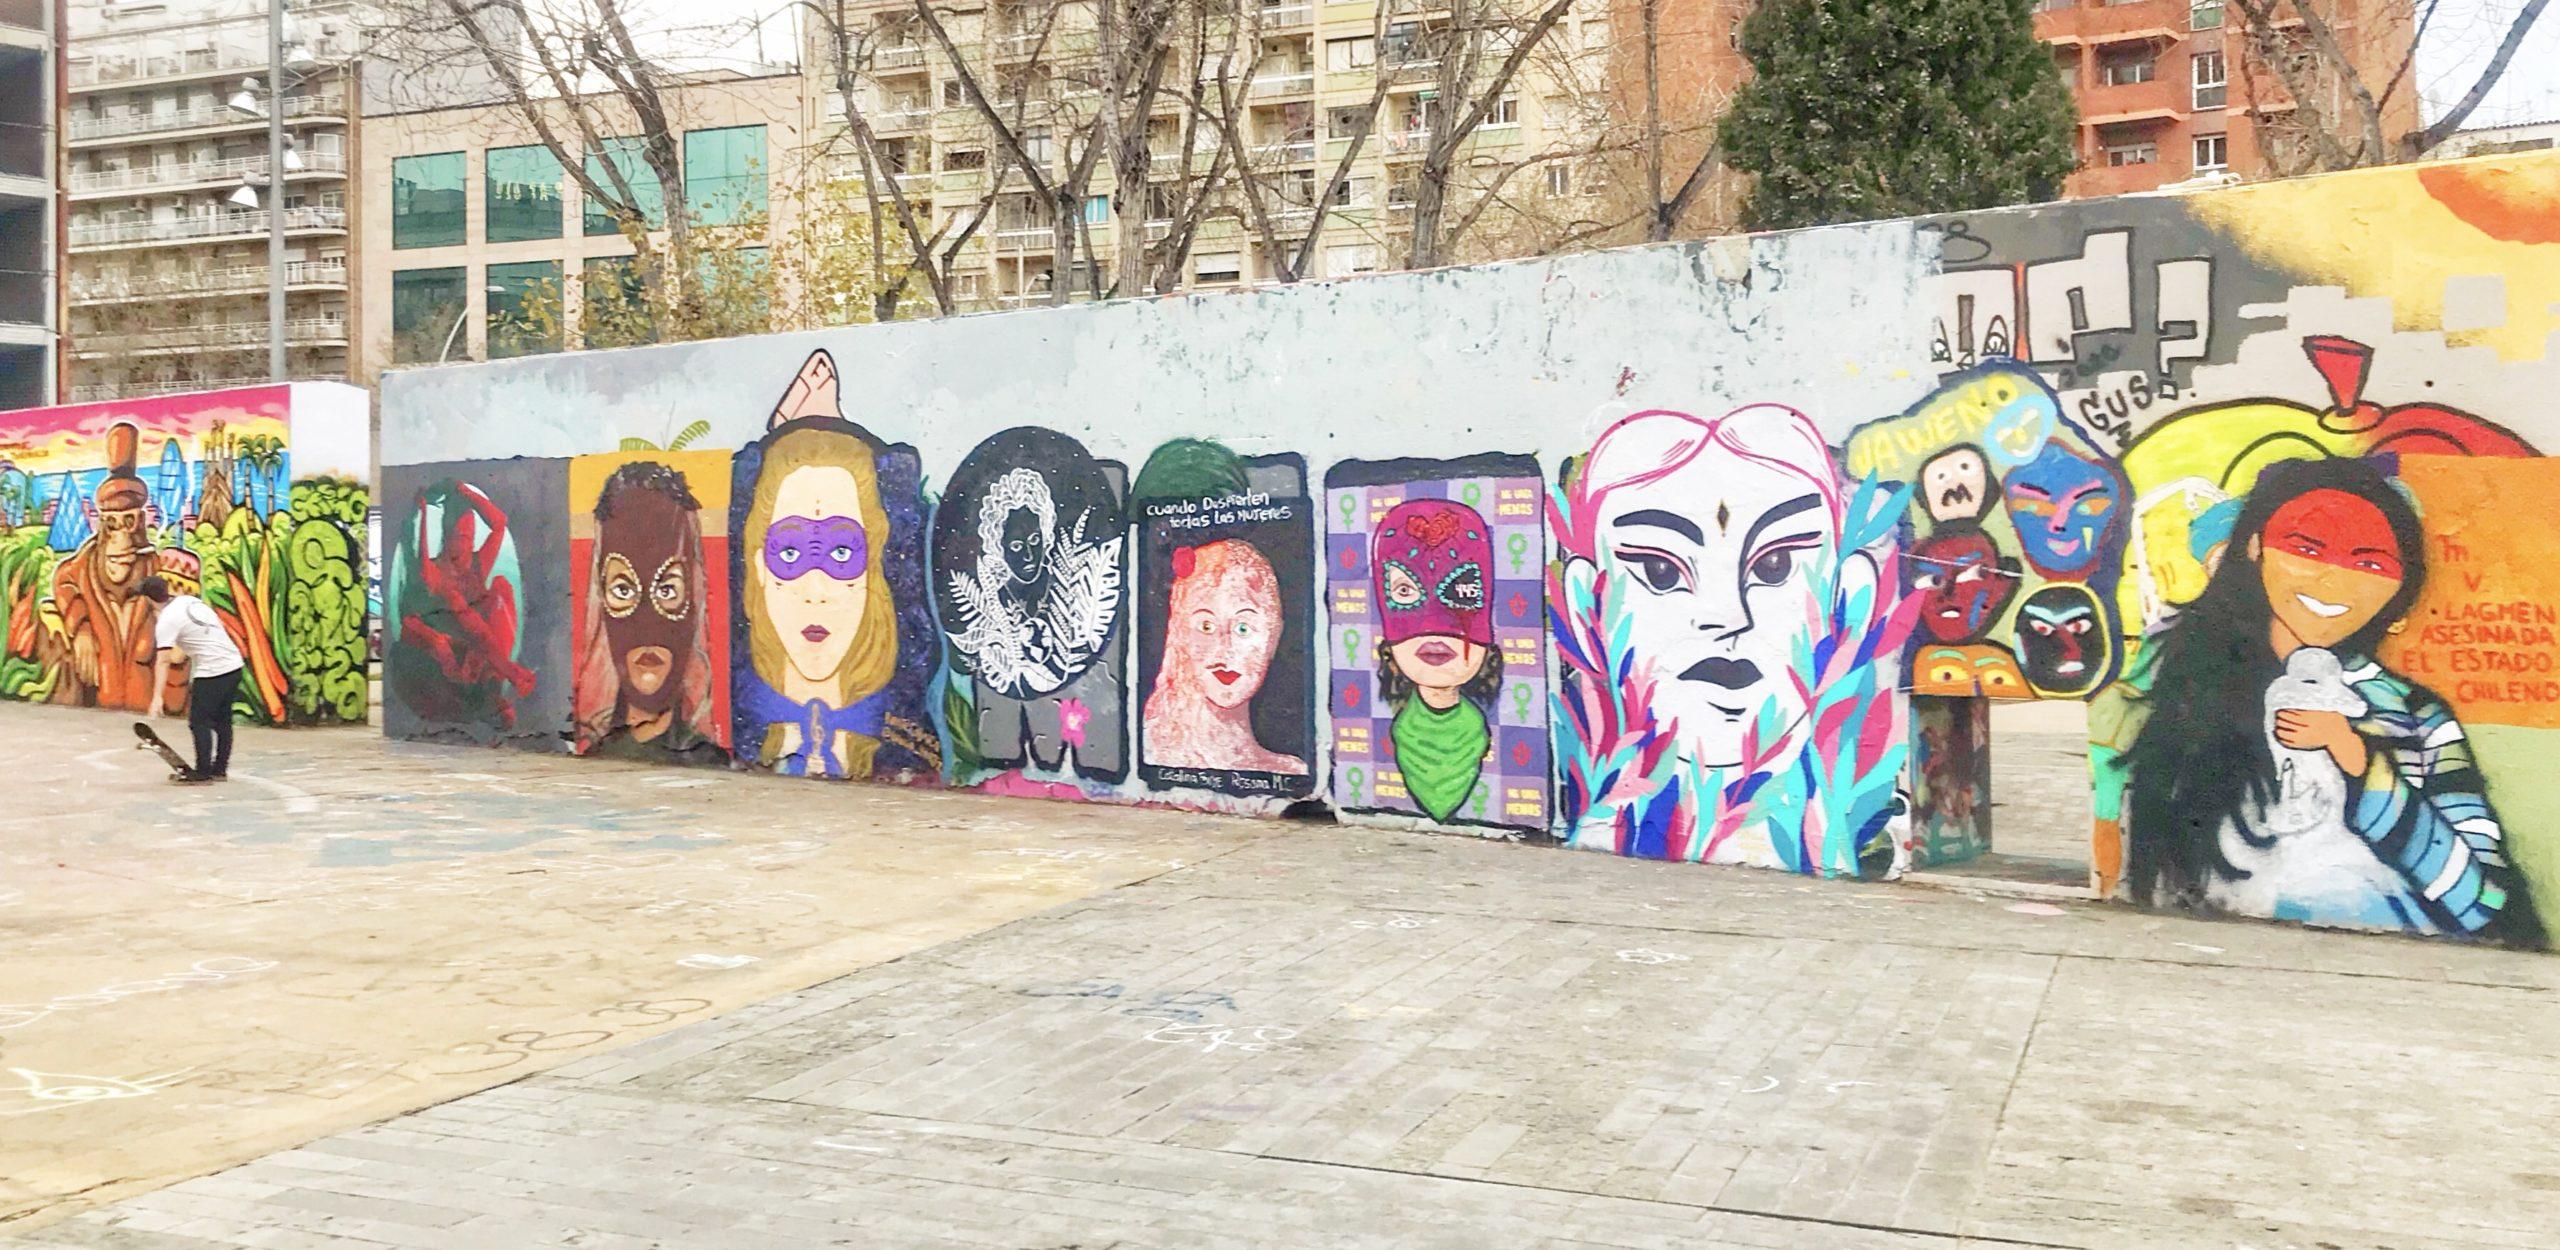 Graffiti femmes, 8 mars, Barcelone